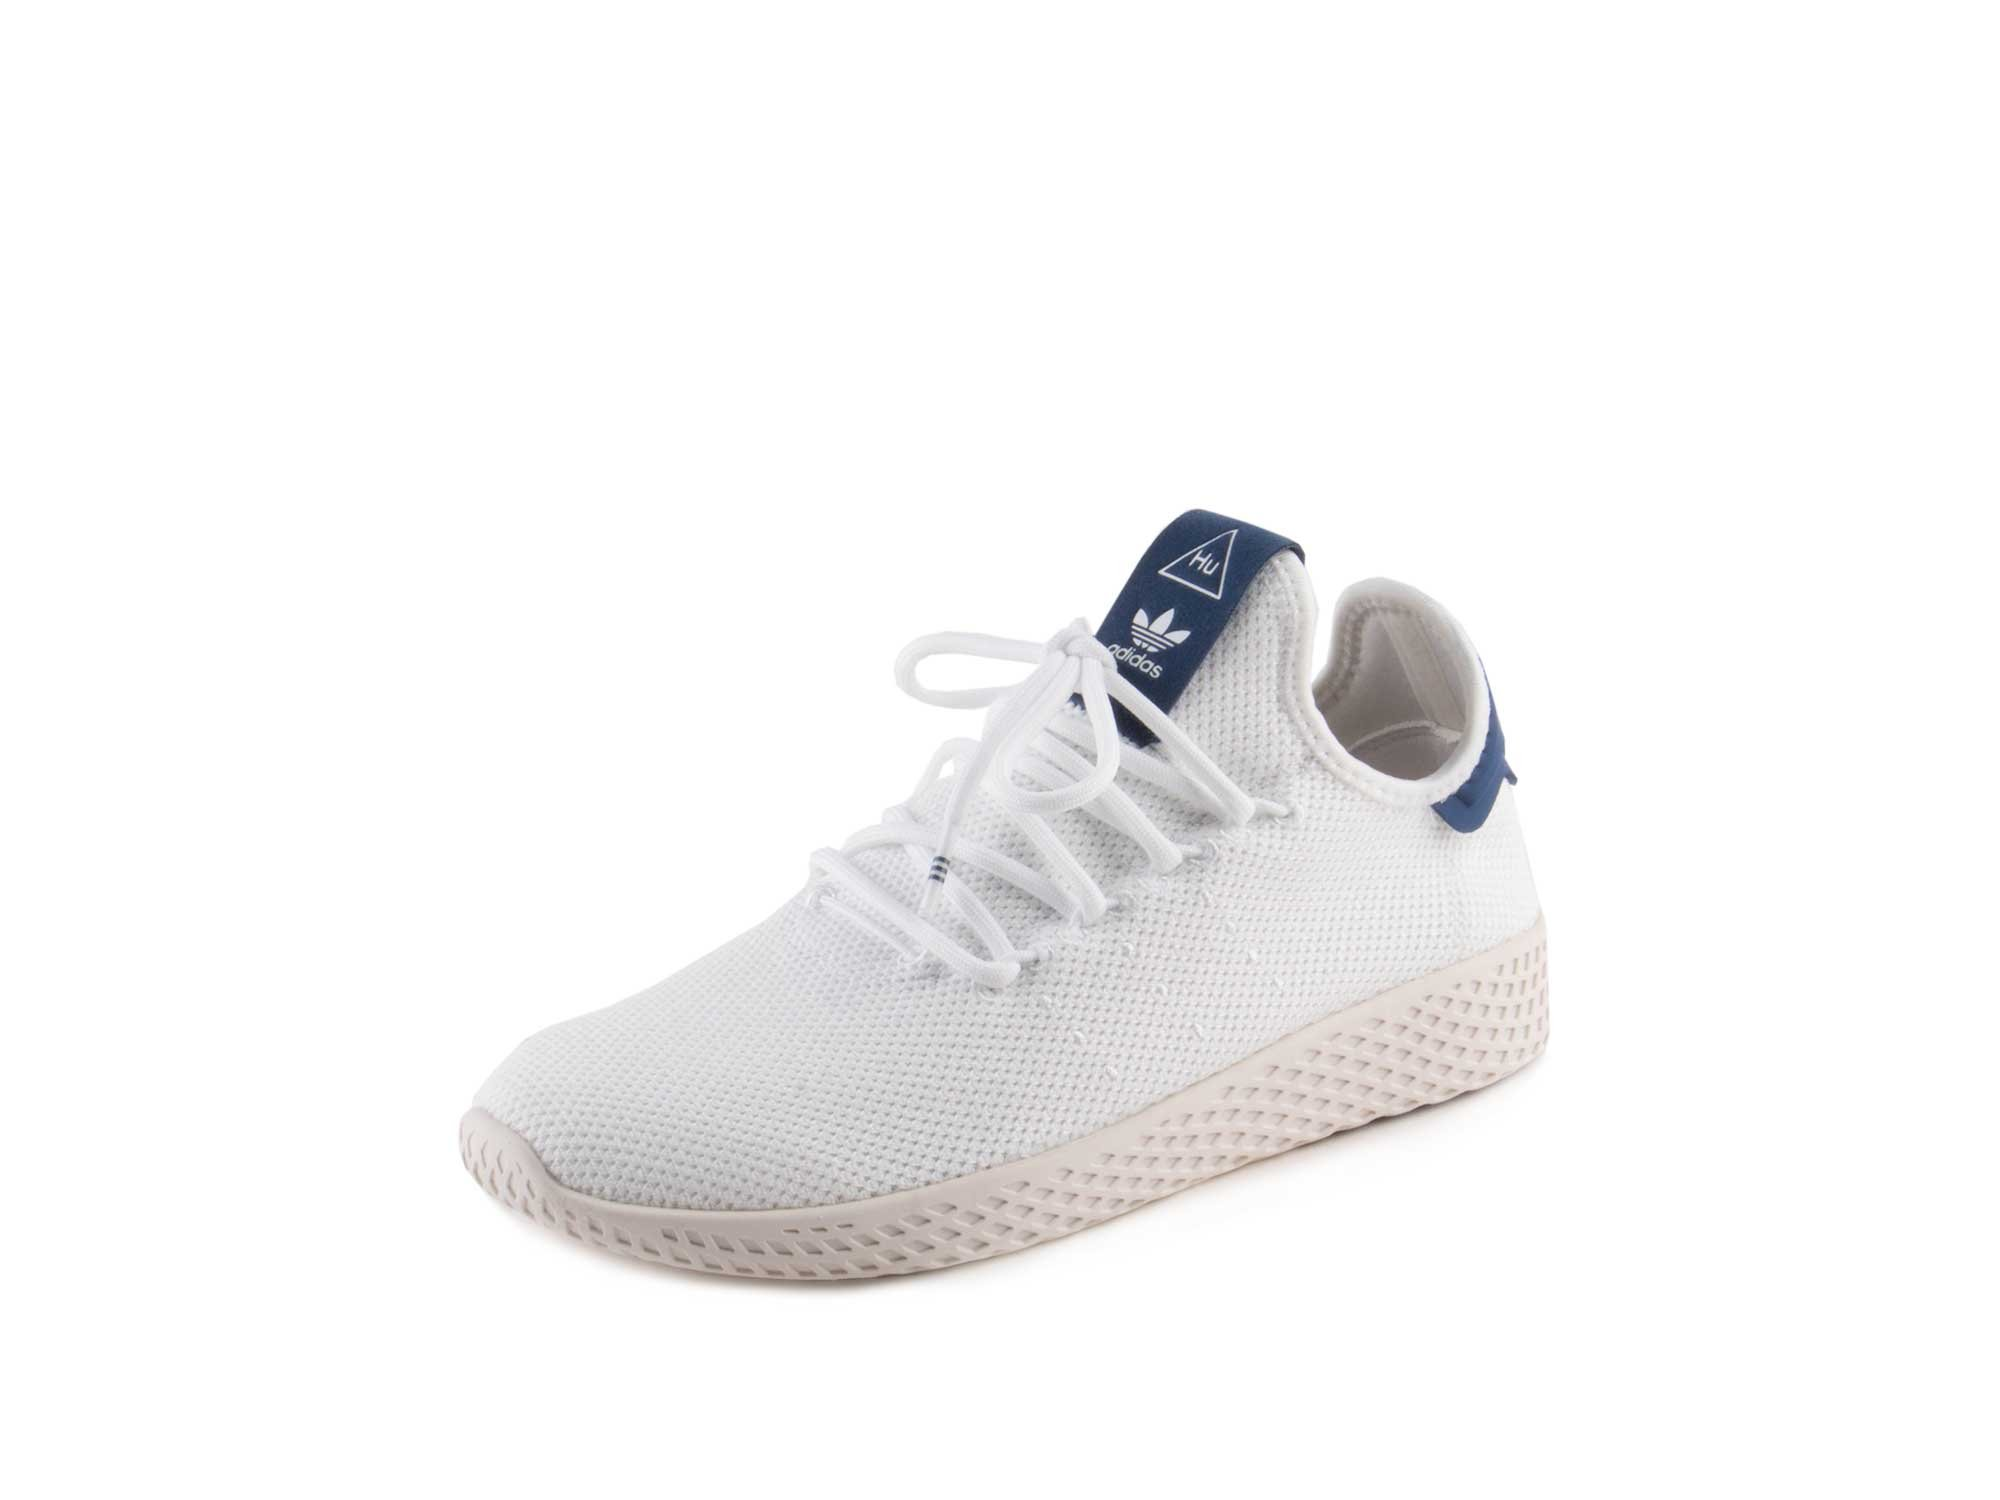 adidas Originals Women's PW Tennis HU W Sneaker, FTWR White, FTWR White, Chalk White, 6.5 M US